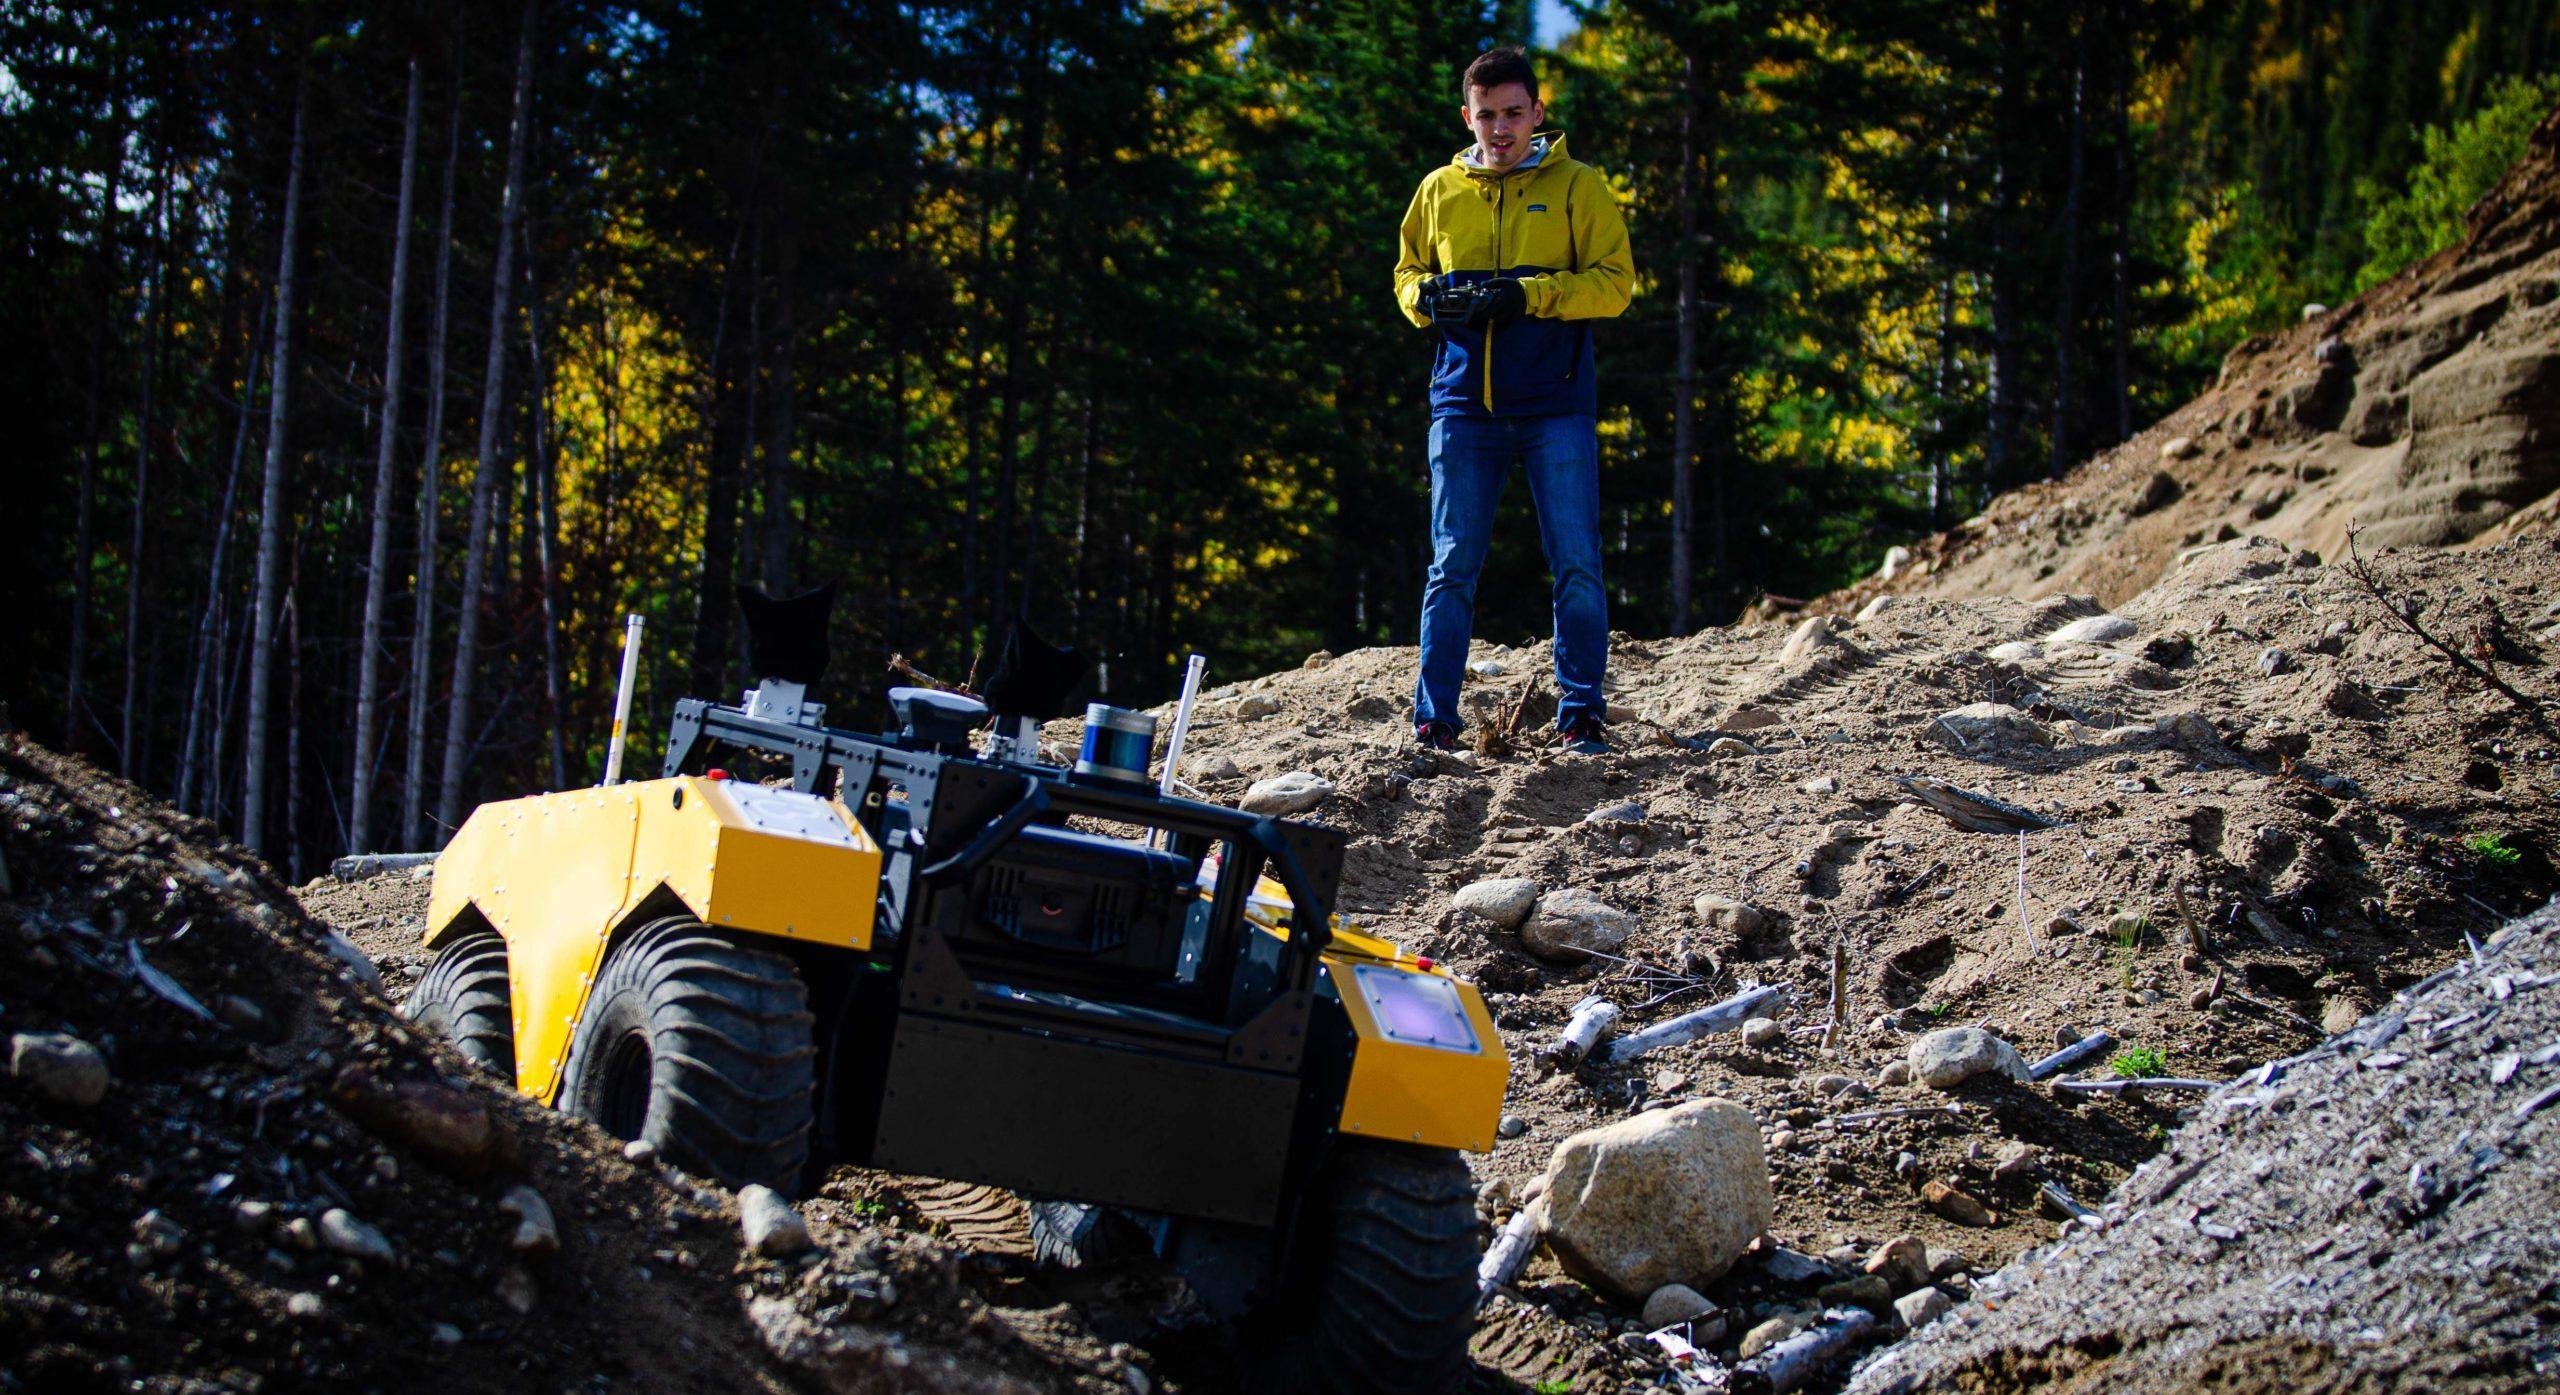 Warthog UGV takes on challenging terrain